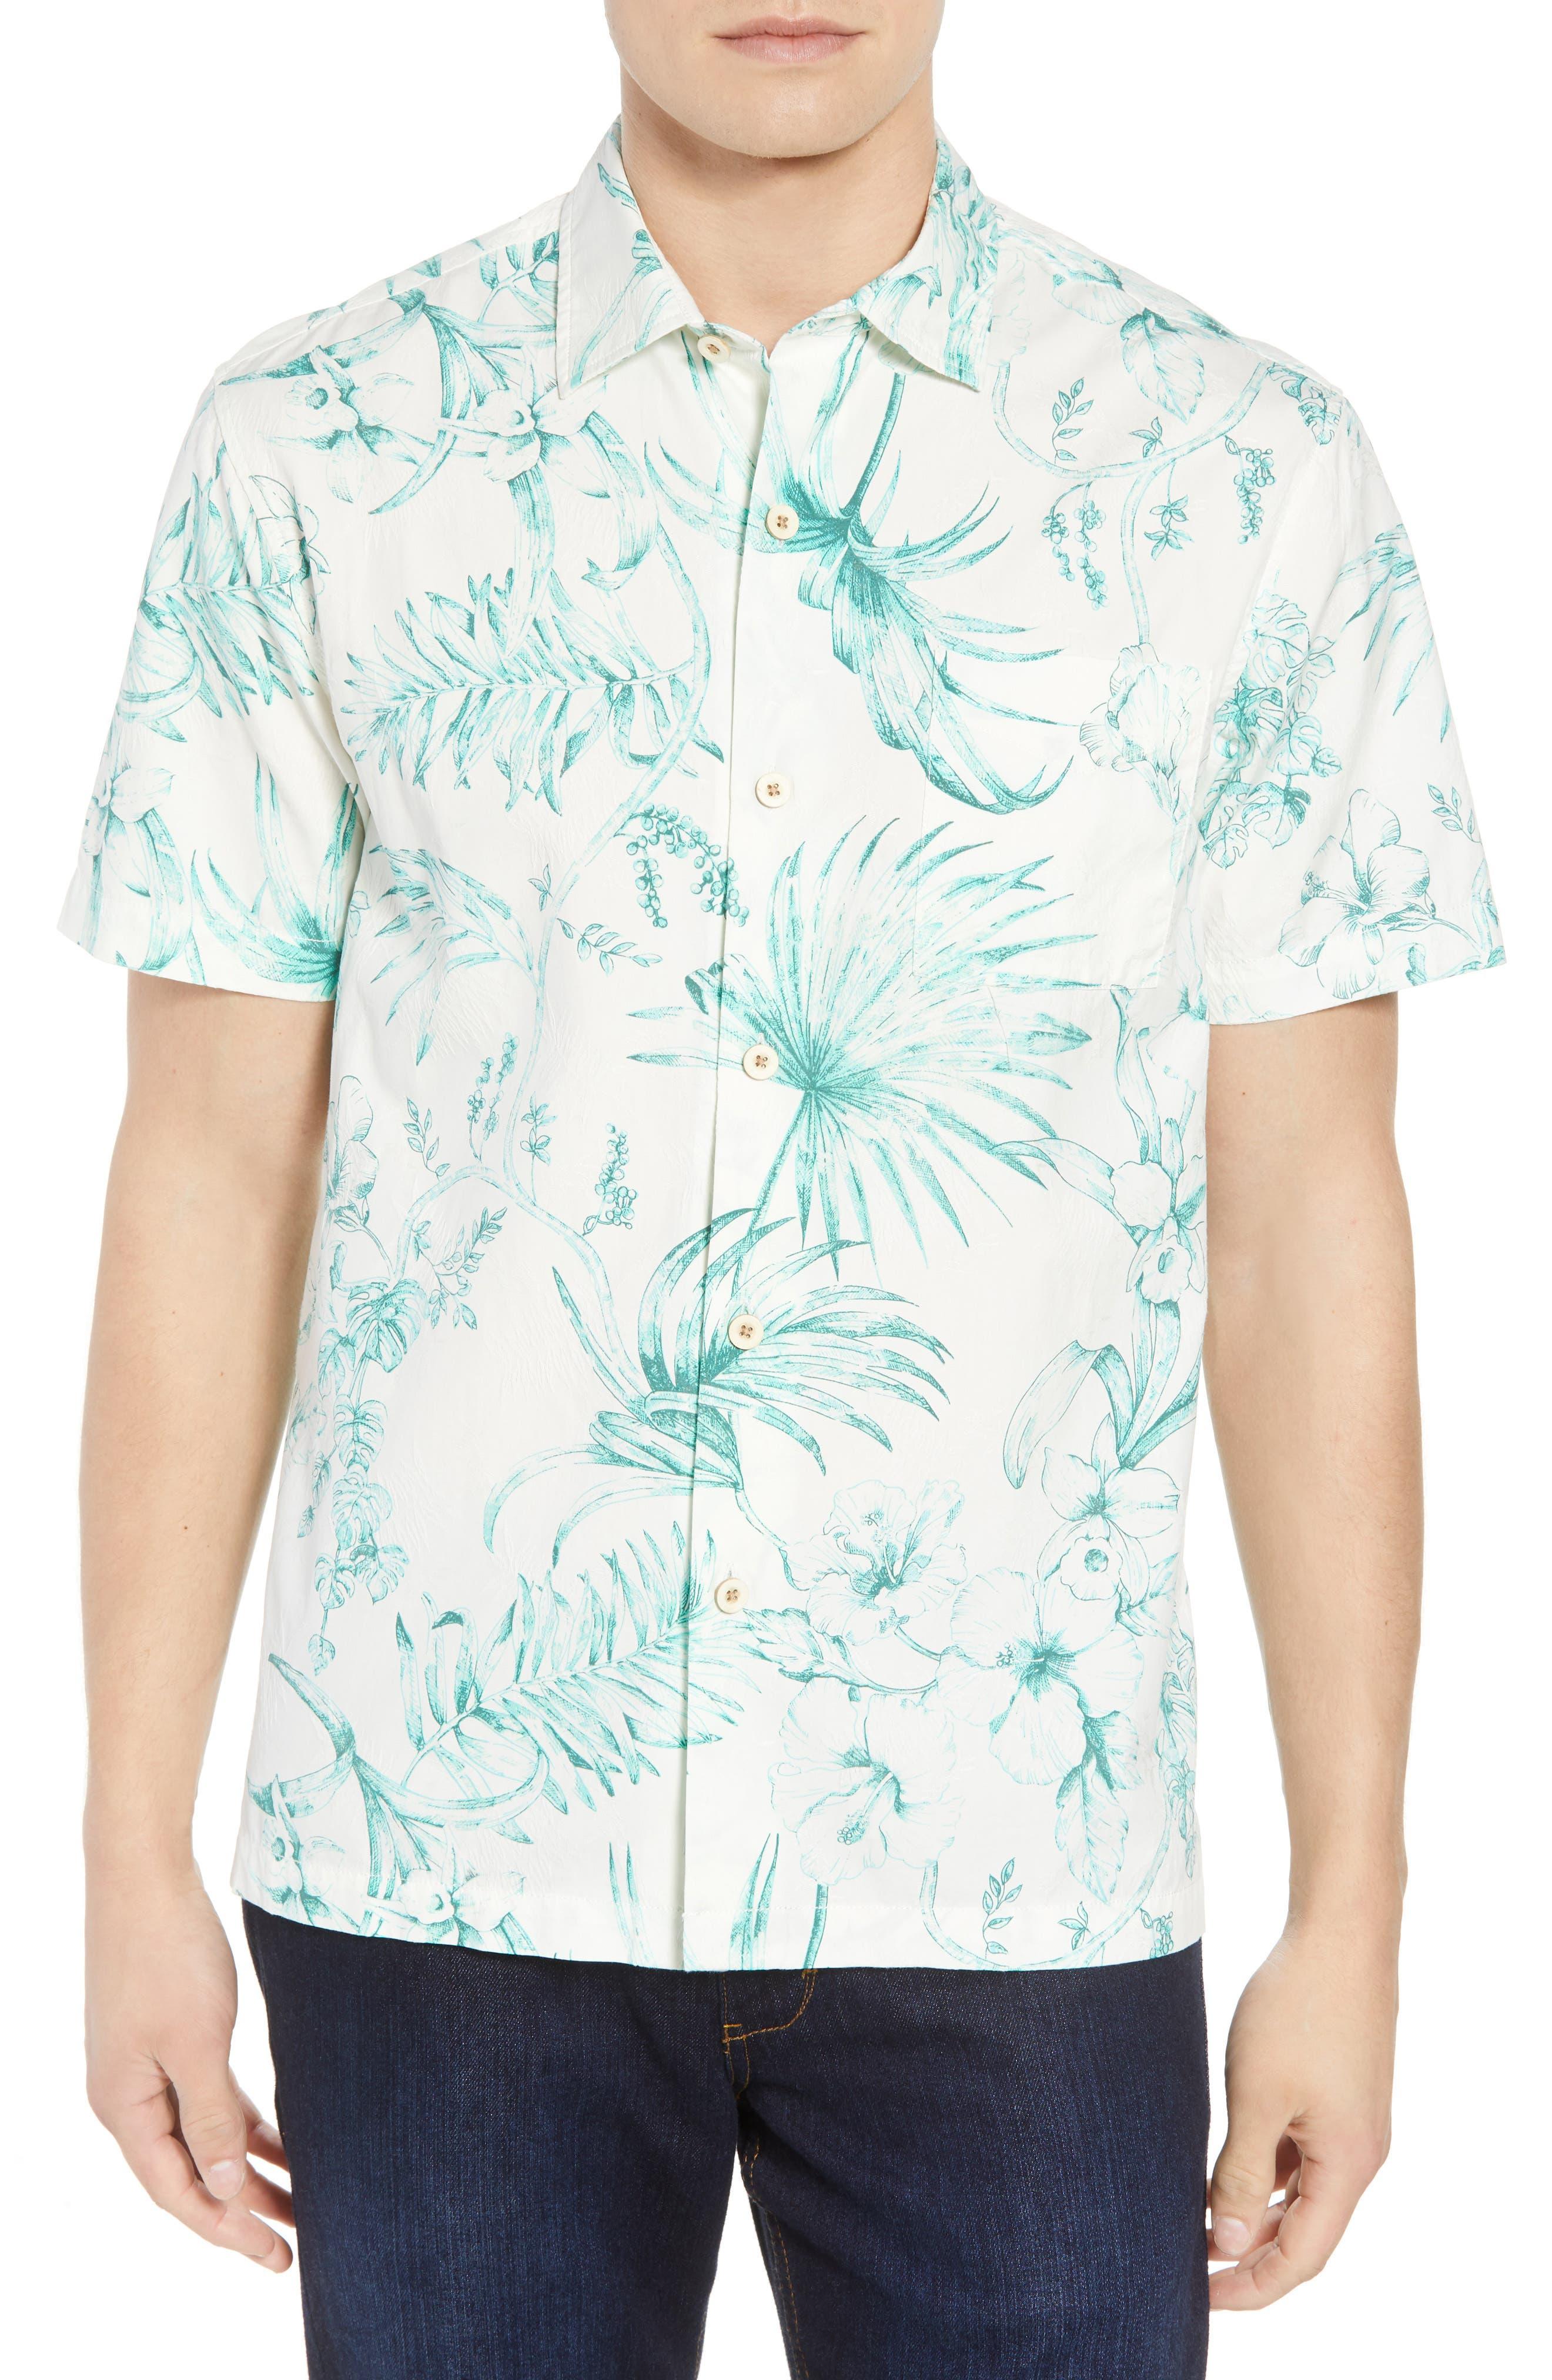 El Botanico Regular Fit Cotton & Silk Sport Shirt,                             Main thumbnail 1, color,                             Marble Cre